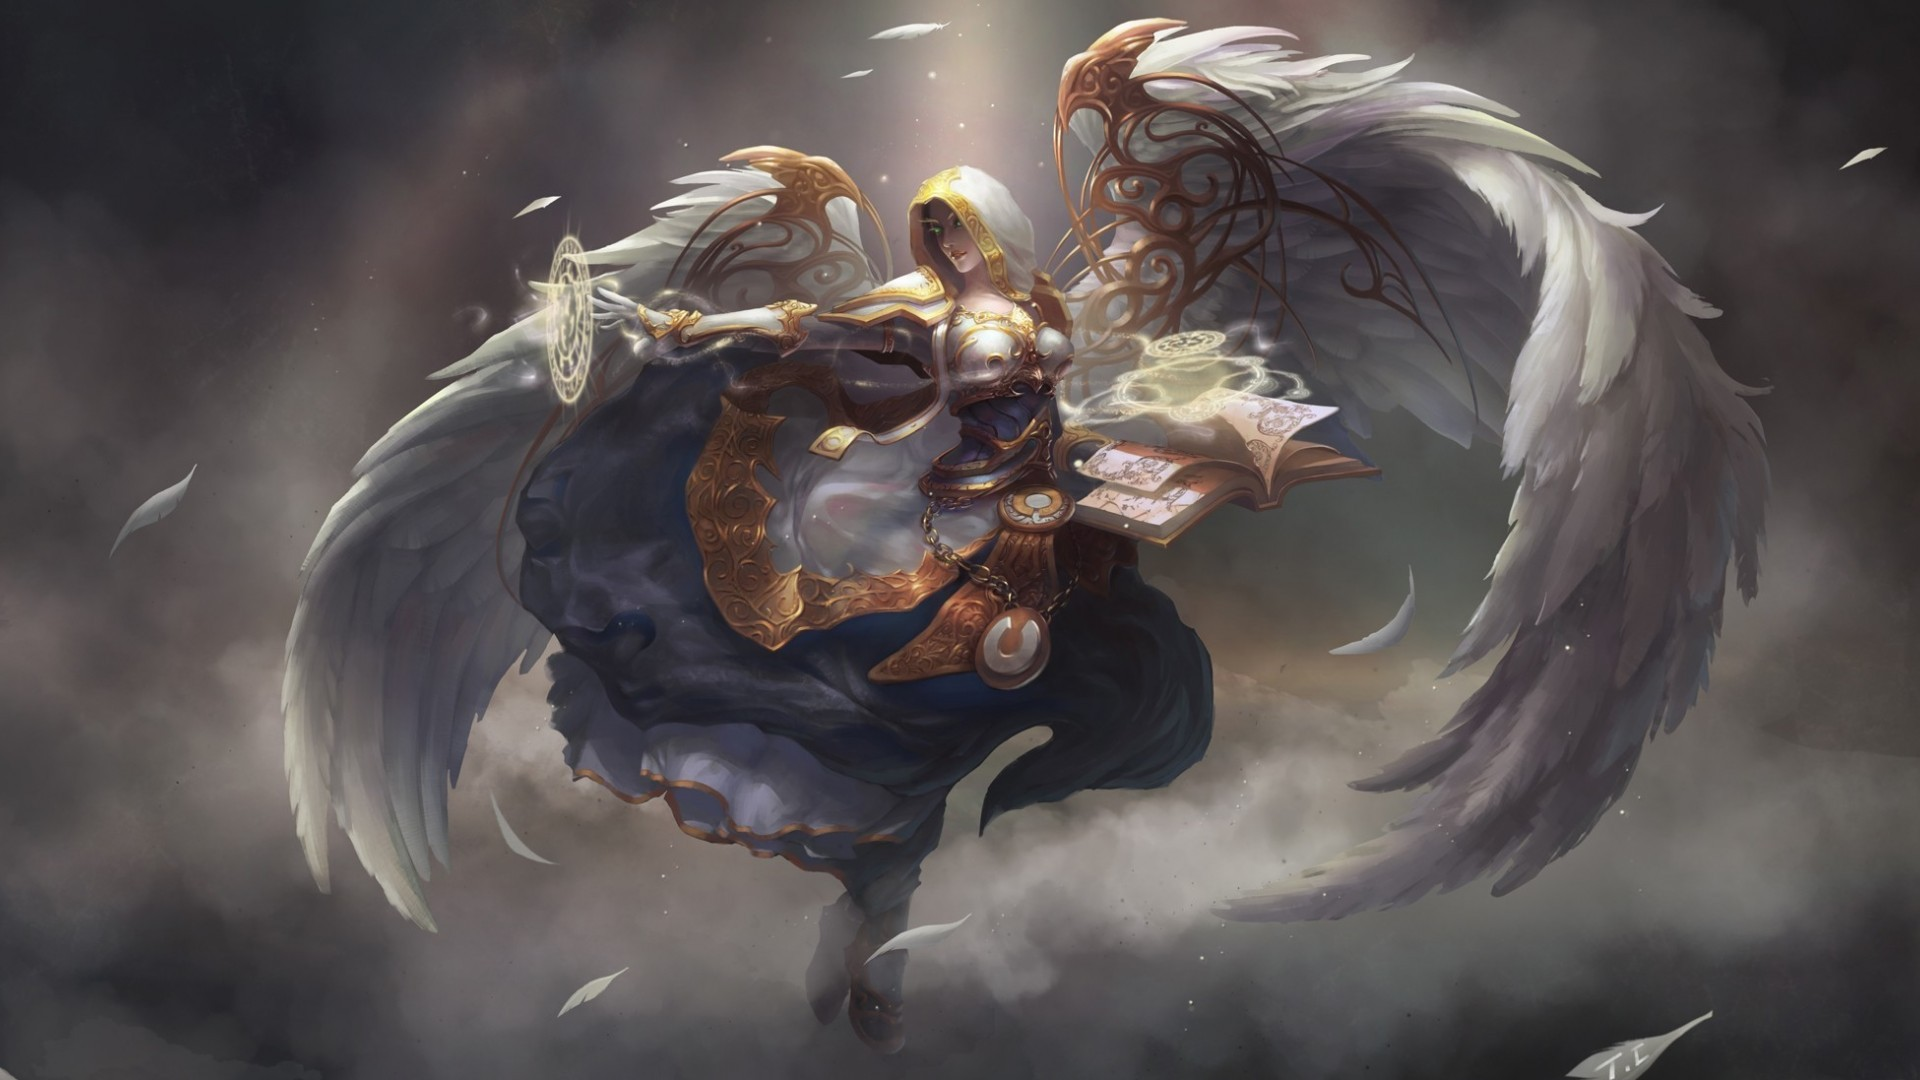 Angel Book Magic Wings wow world warcraft fantasy wallpaper background 1920x1080